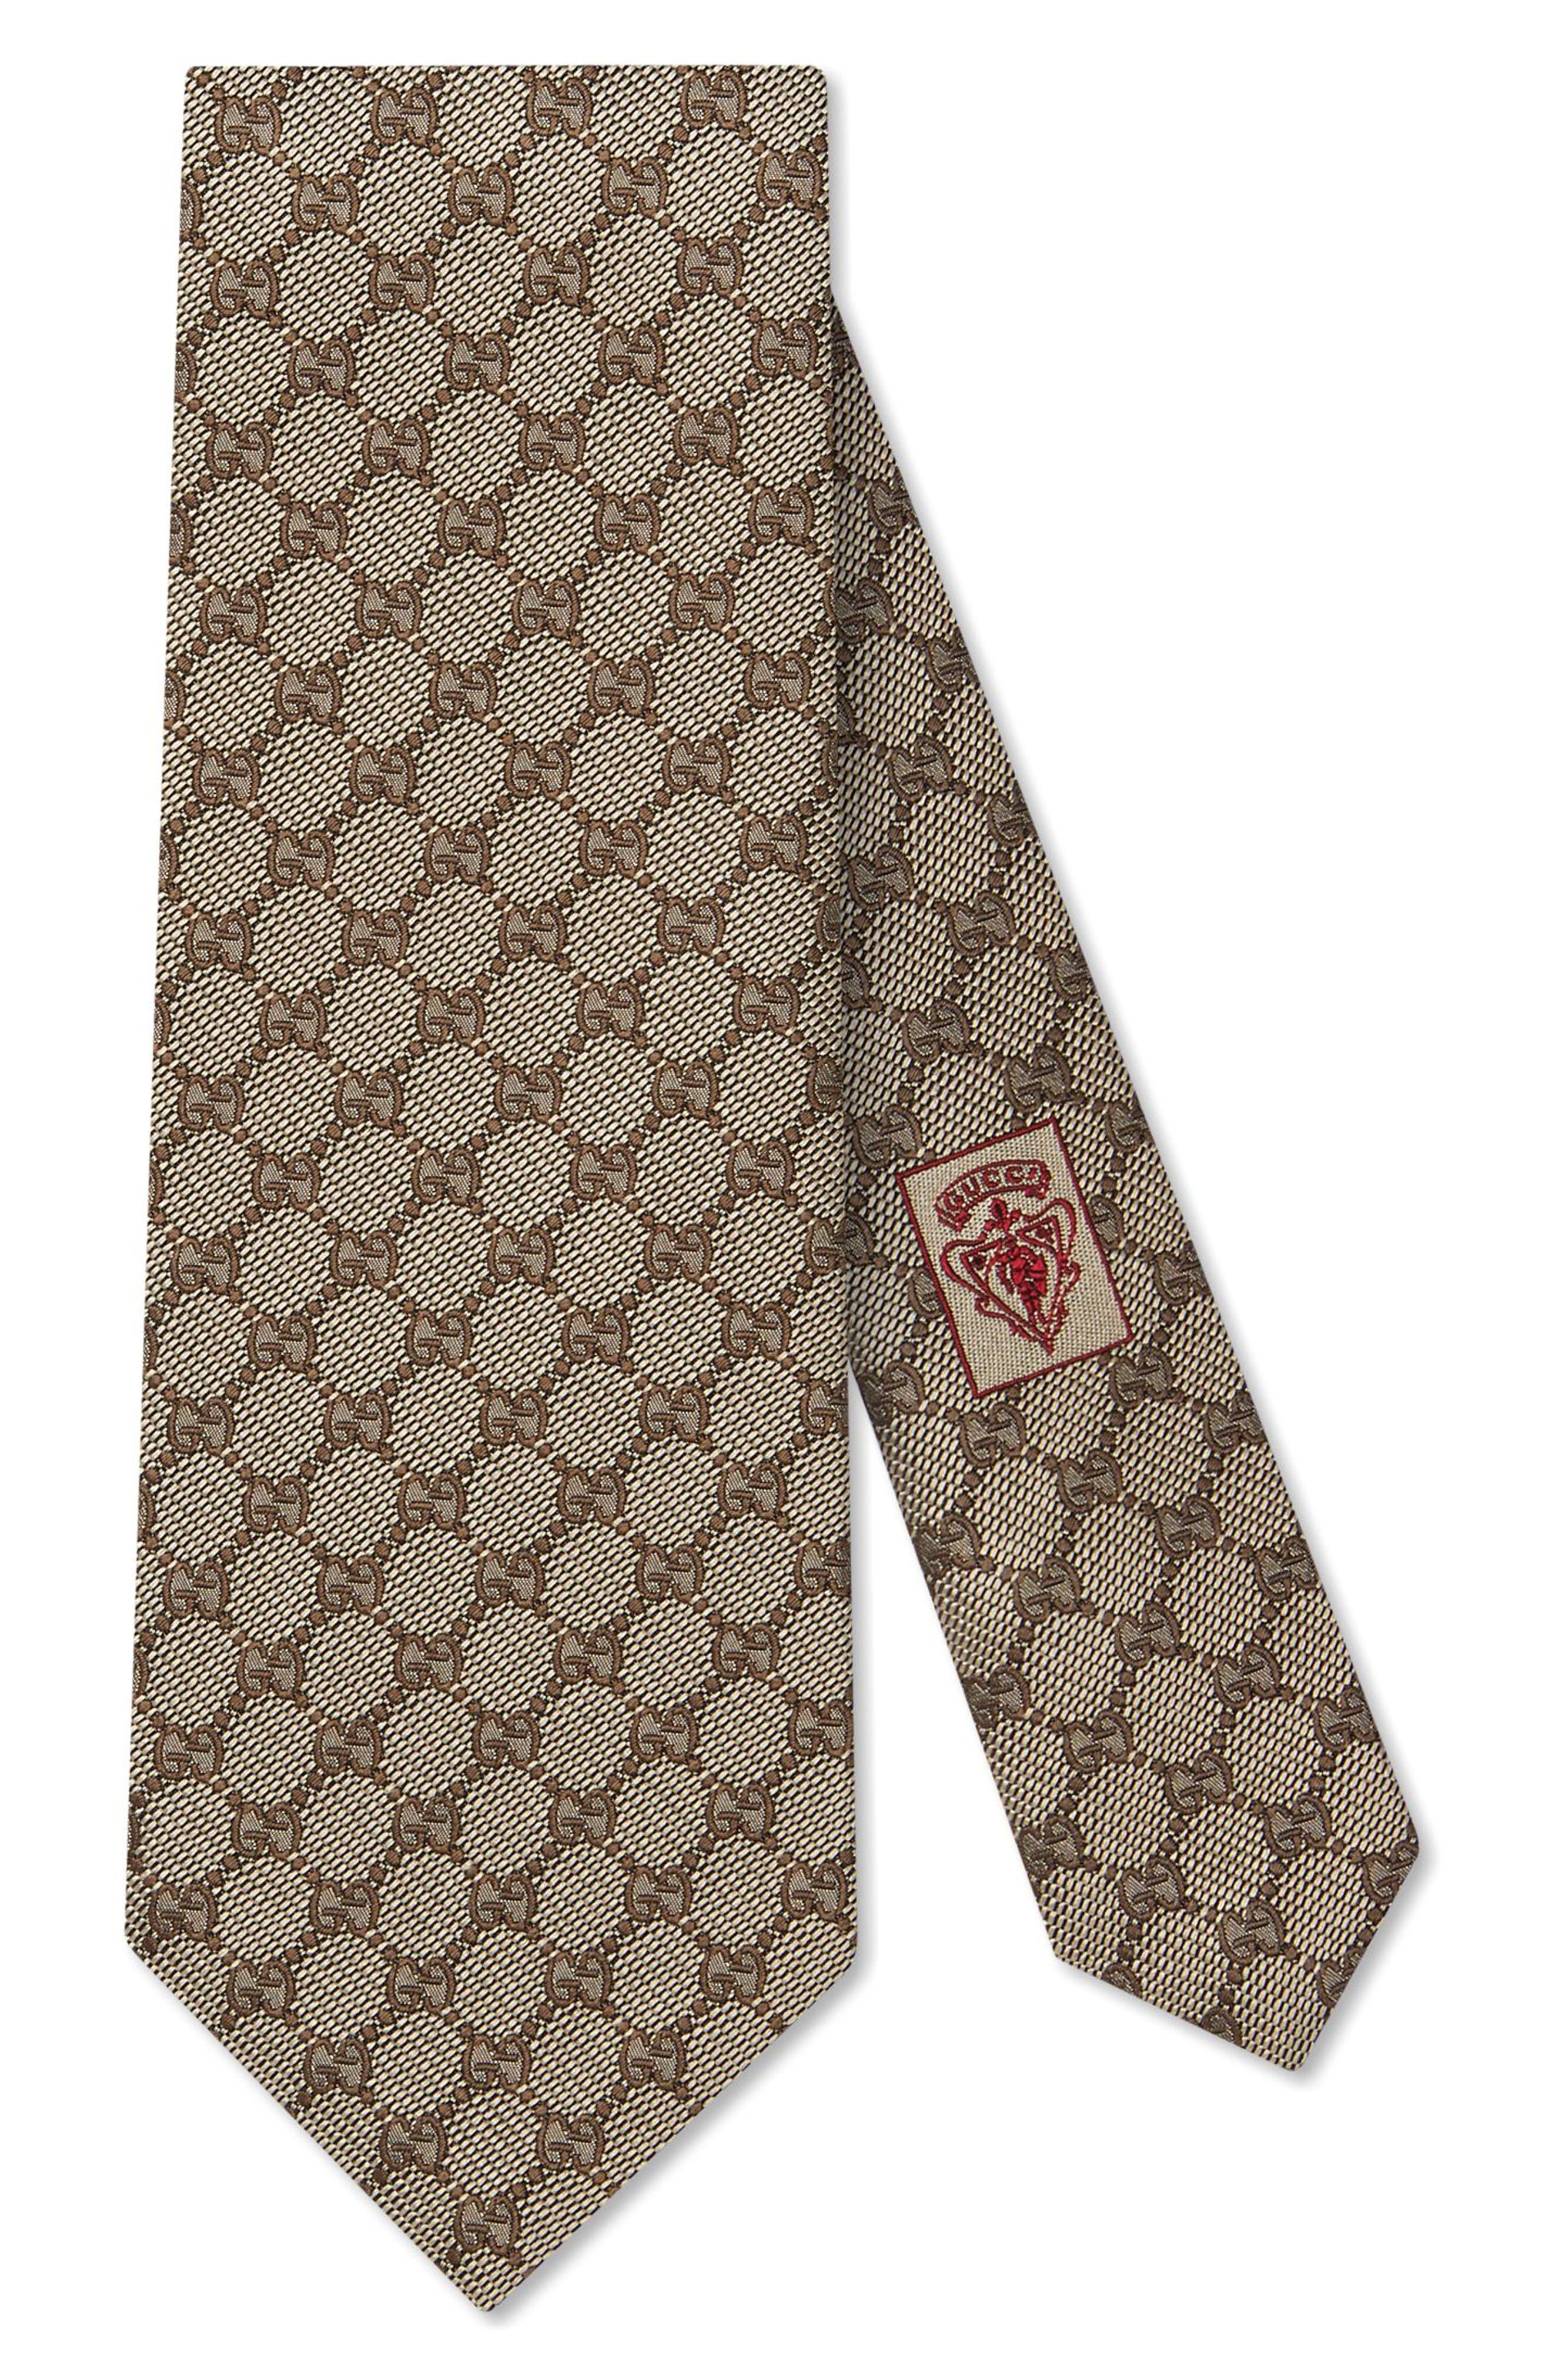 Arend Print Silk Tie,                         Main,                         color, 9700 Beige